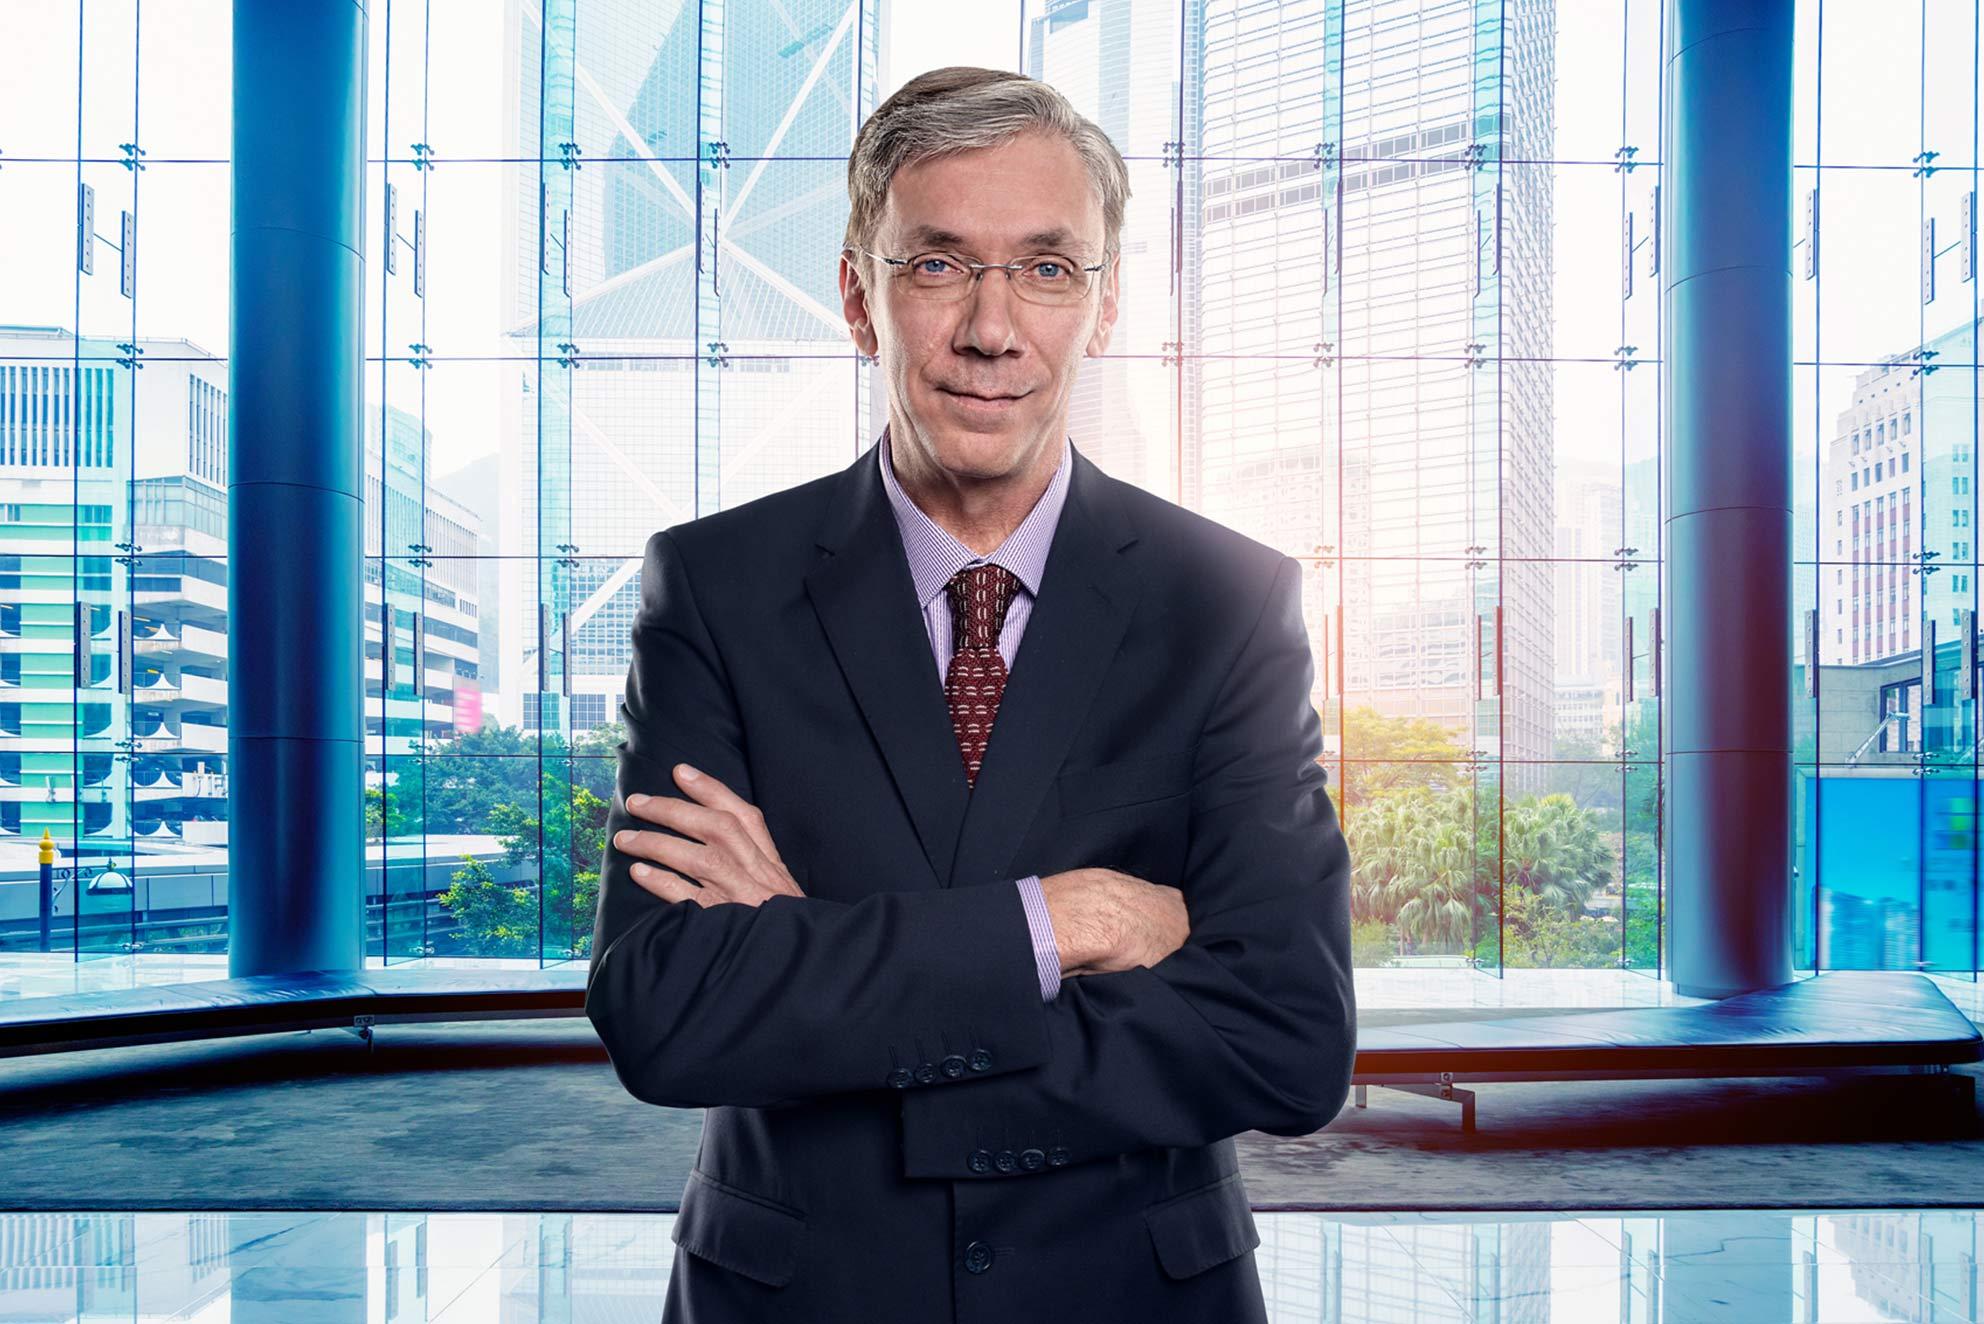 business-man-front-view-corporate-photography-brandon-barnard-photography.jpg